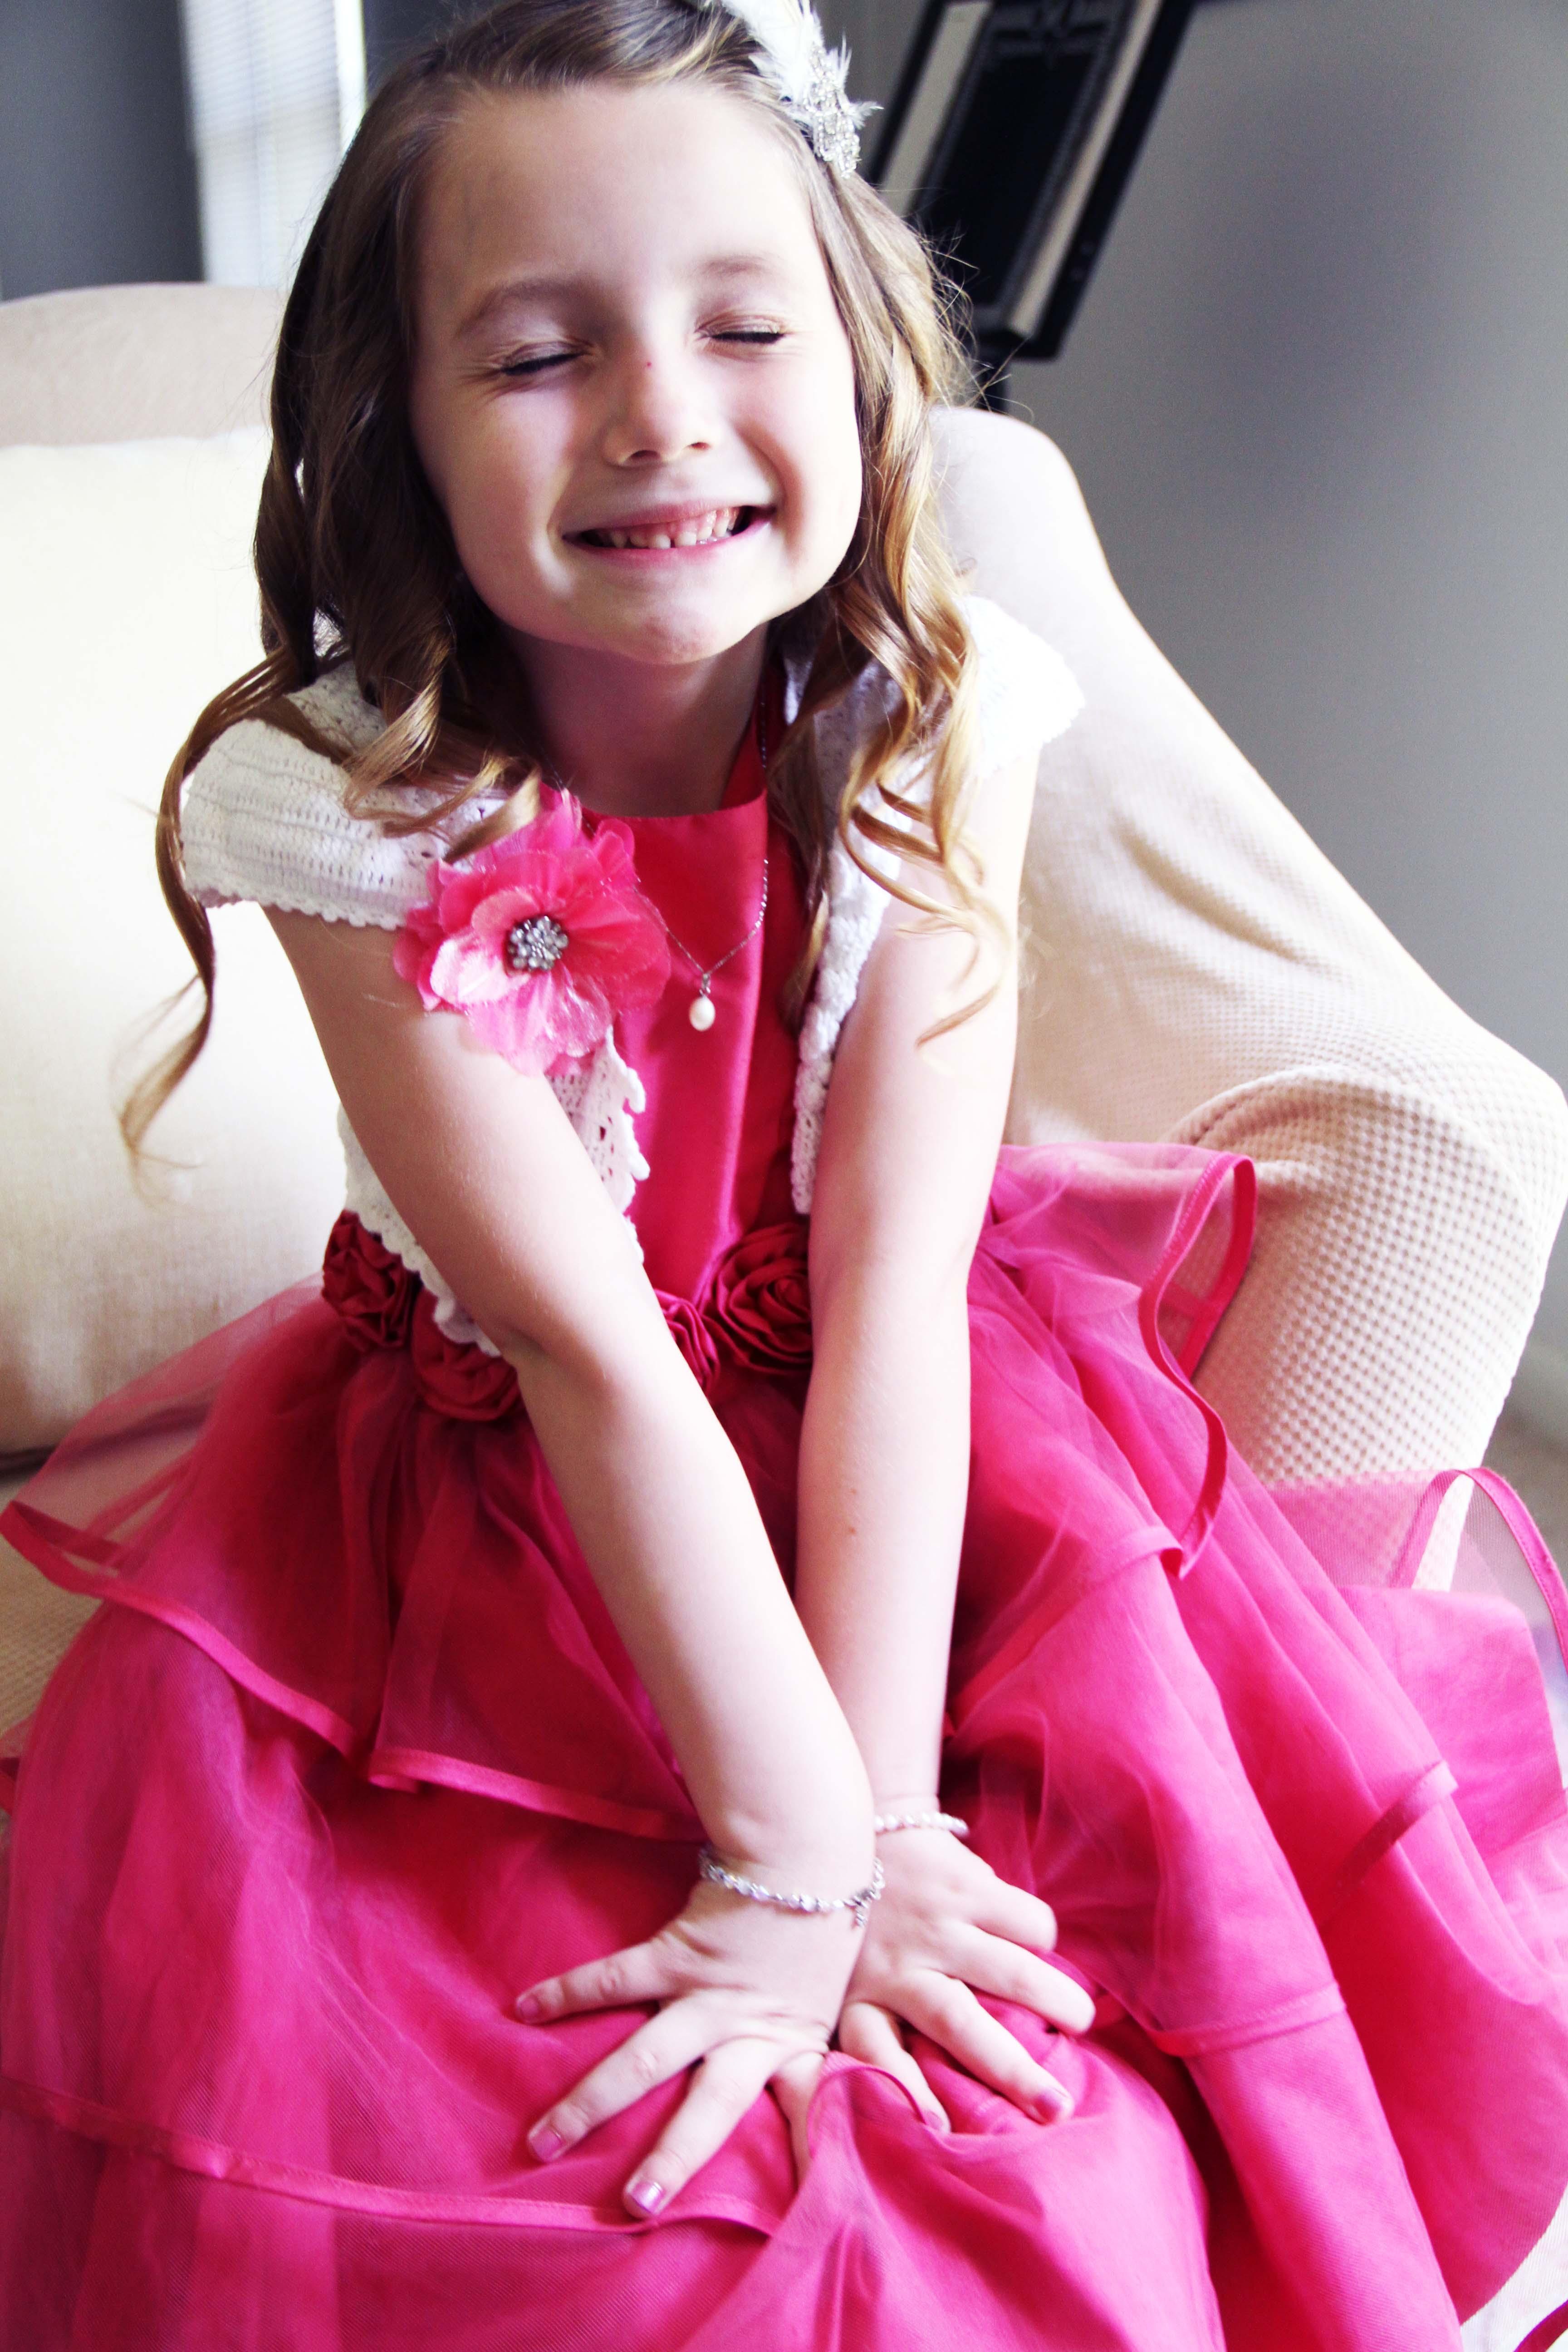 Fluffy in pink dress